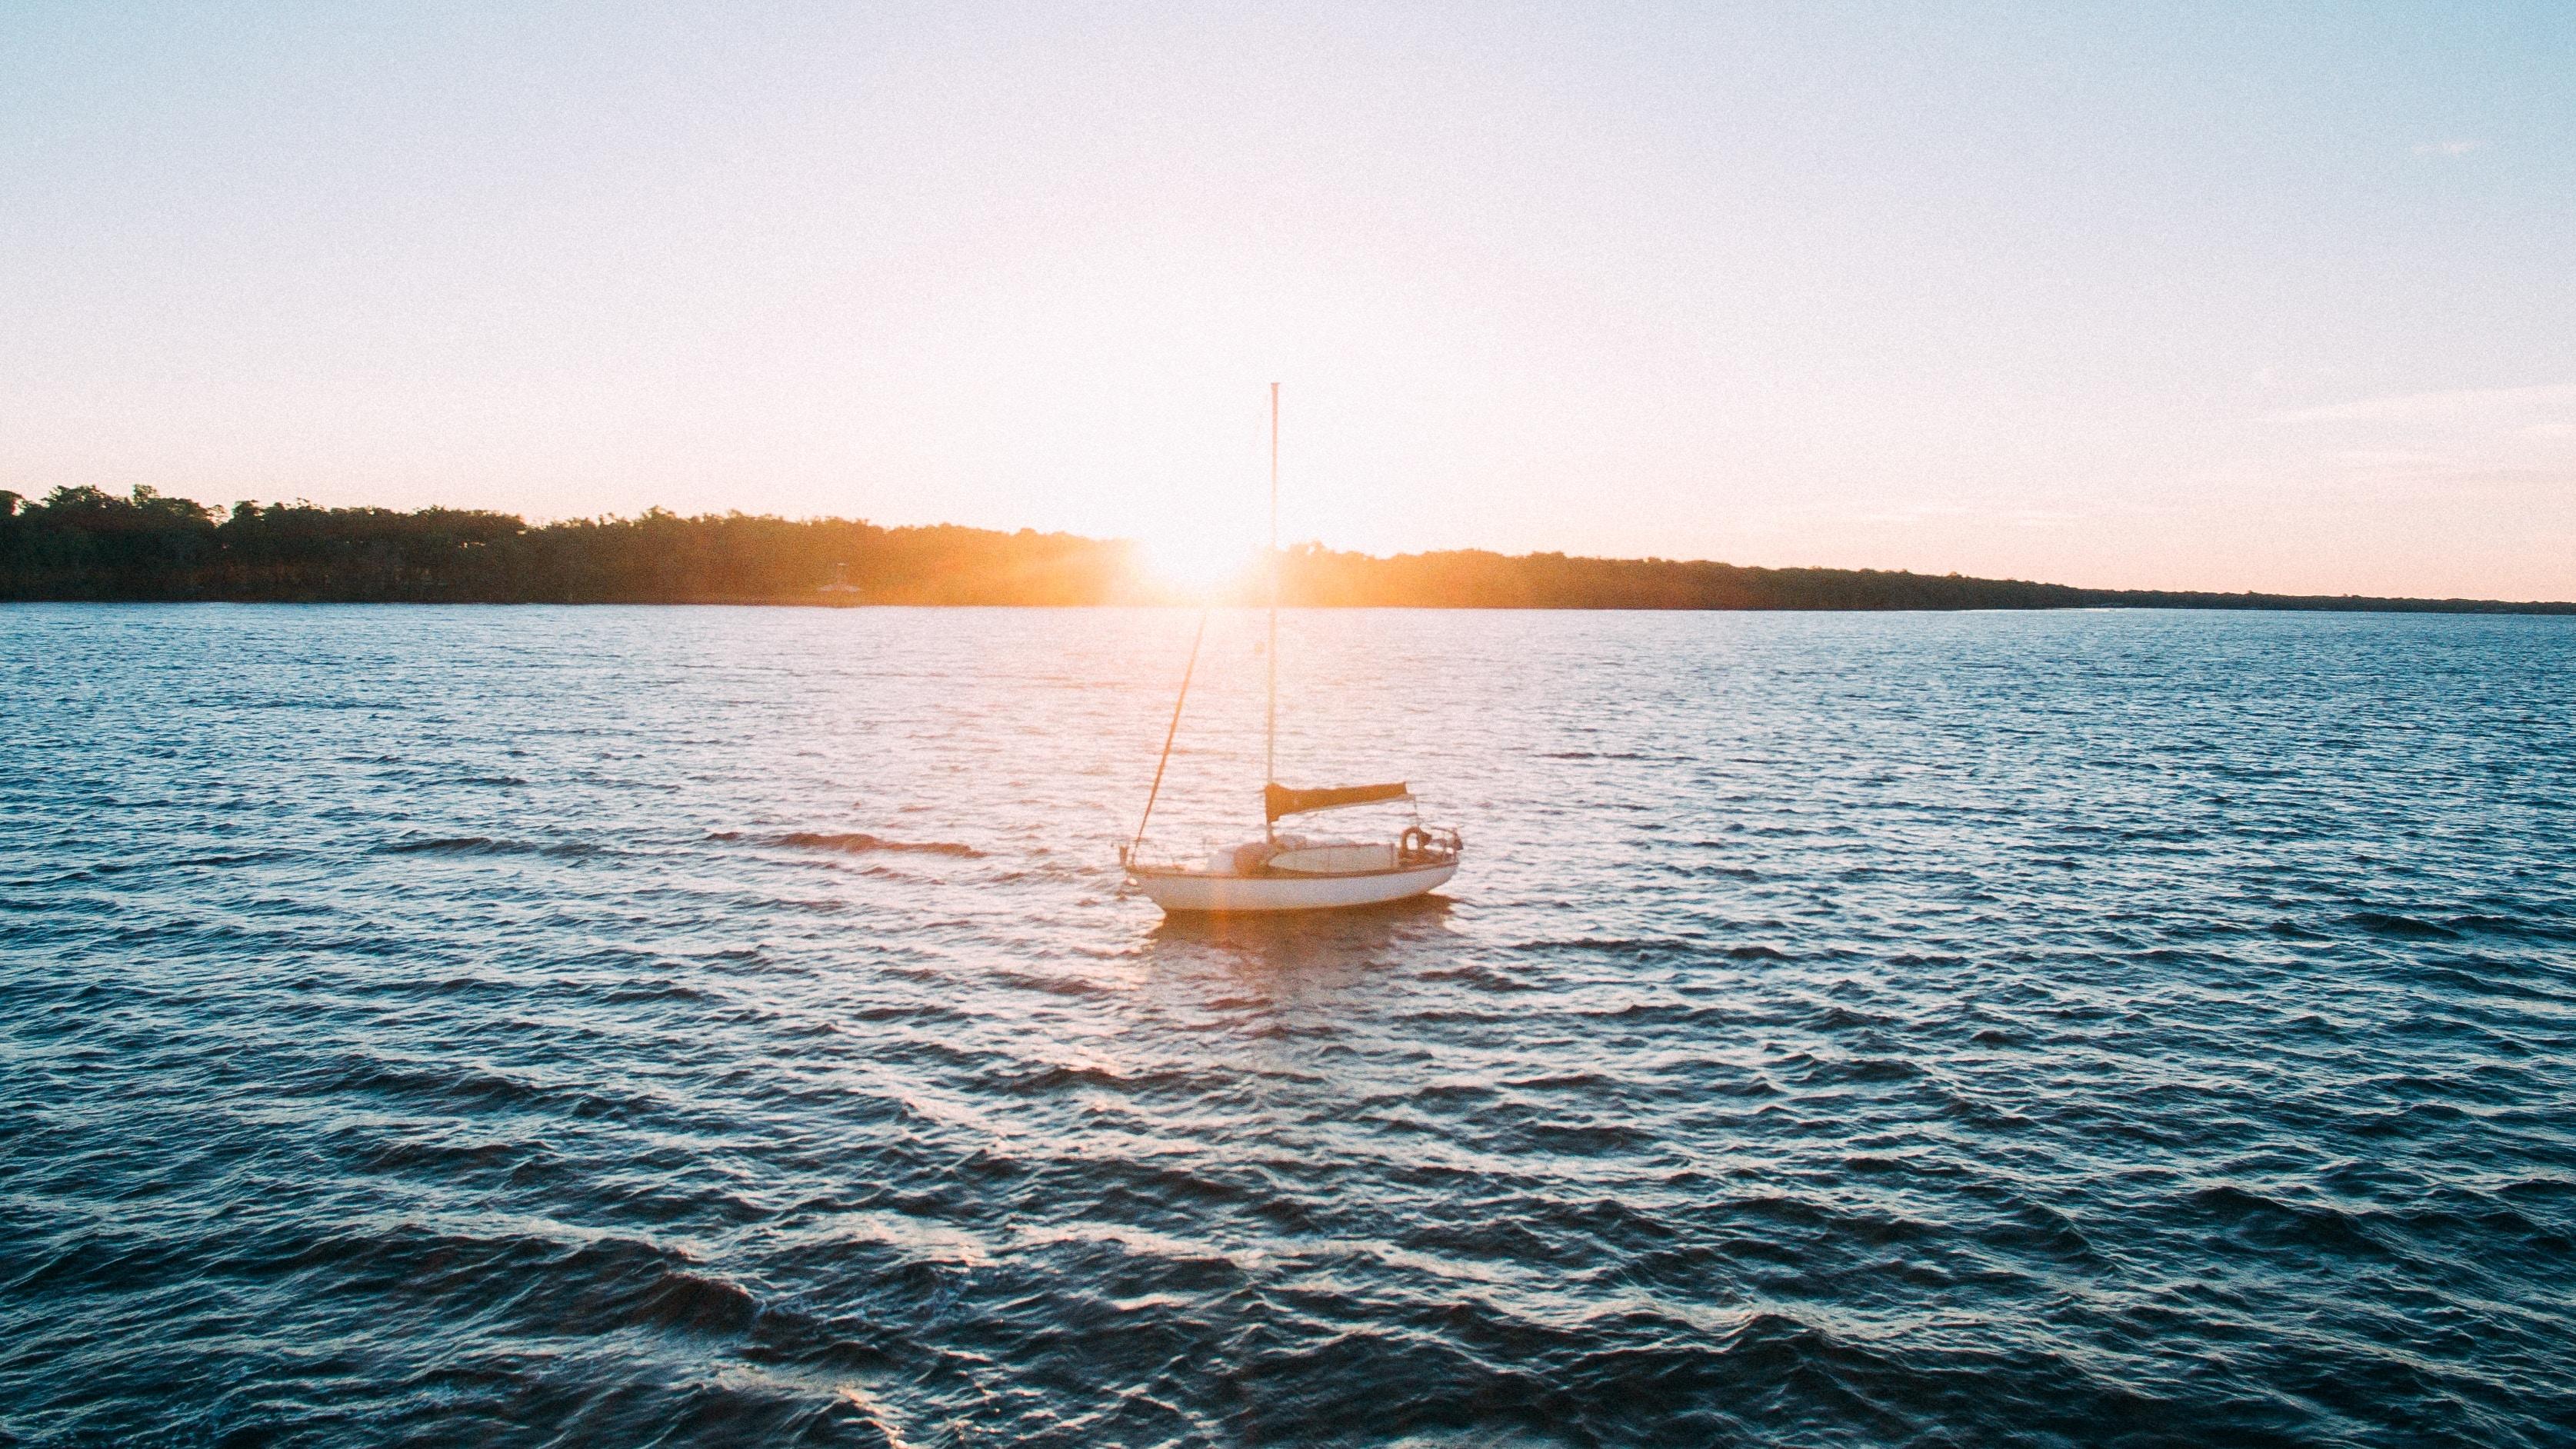 A photo of a small sailboat by Lance Asper on Unsplash